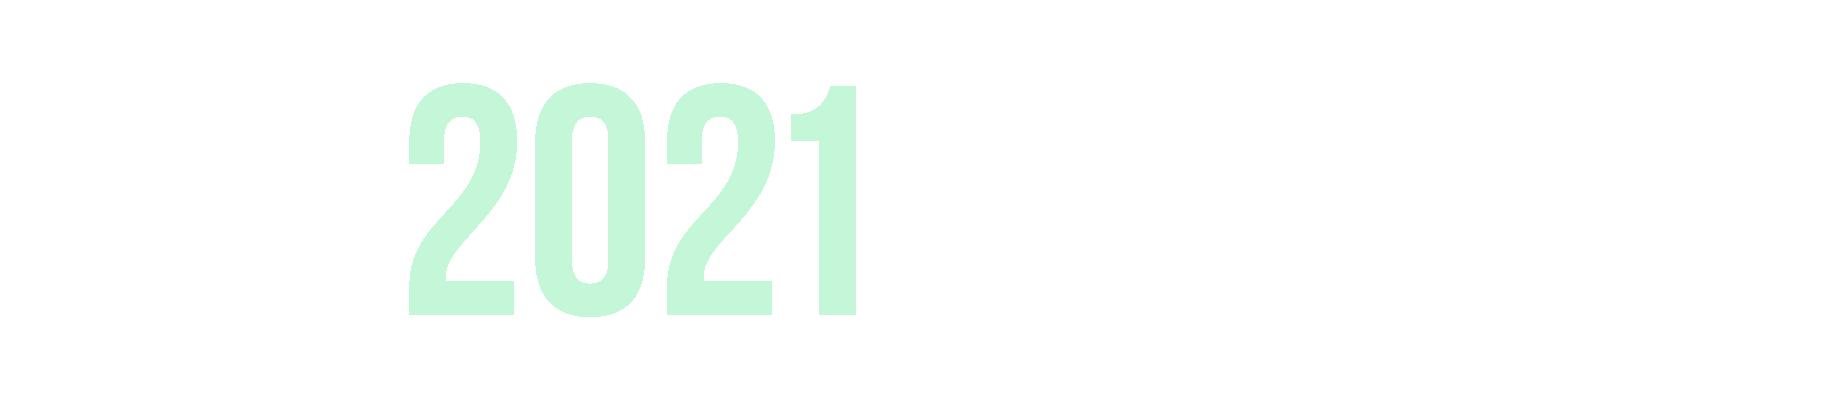 Best 2021 Reviews_2